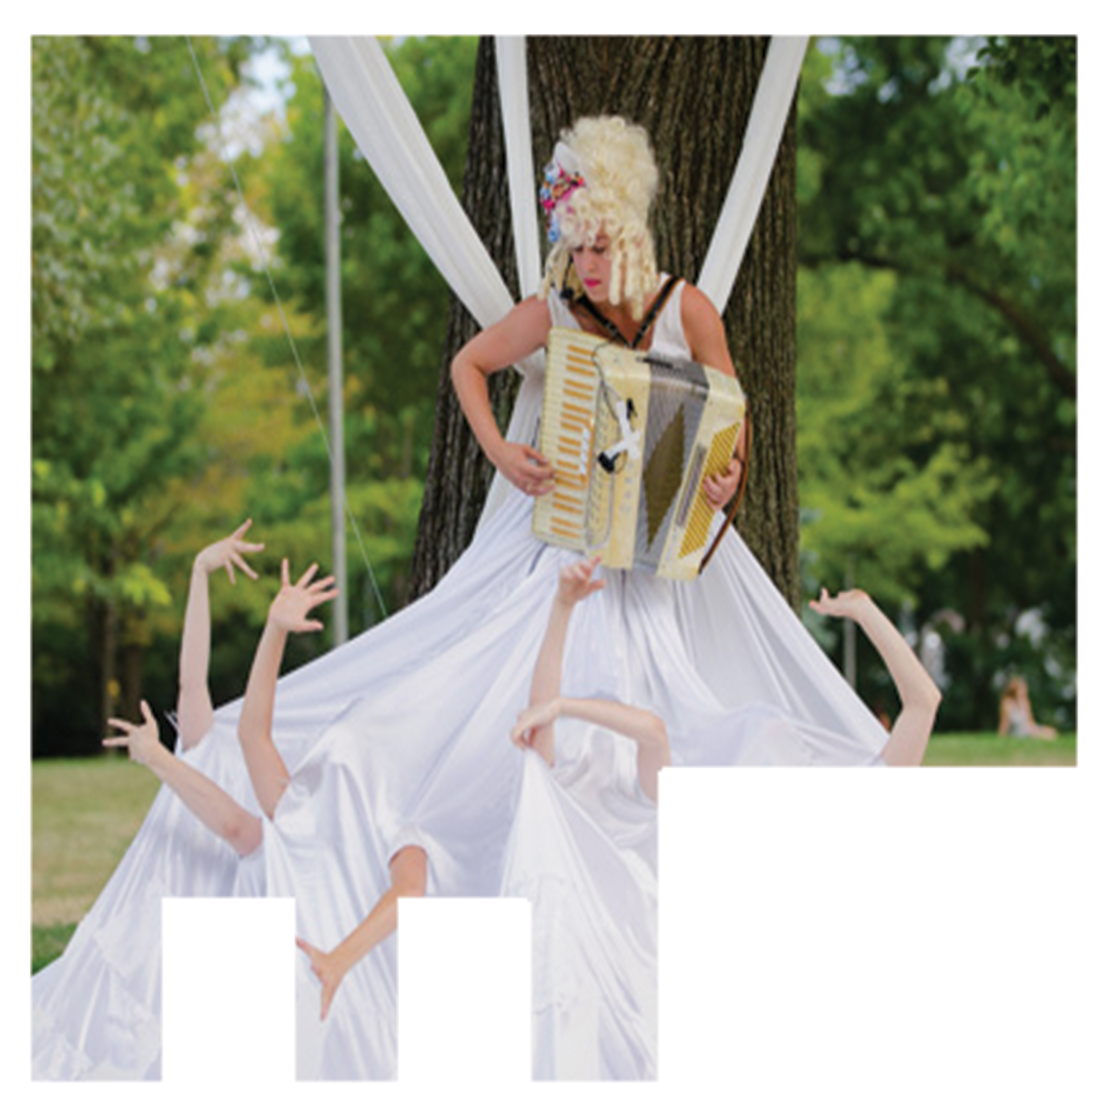 Dusk Dances 2013  in the photo.